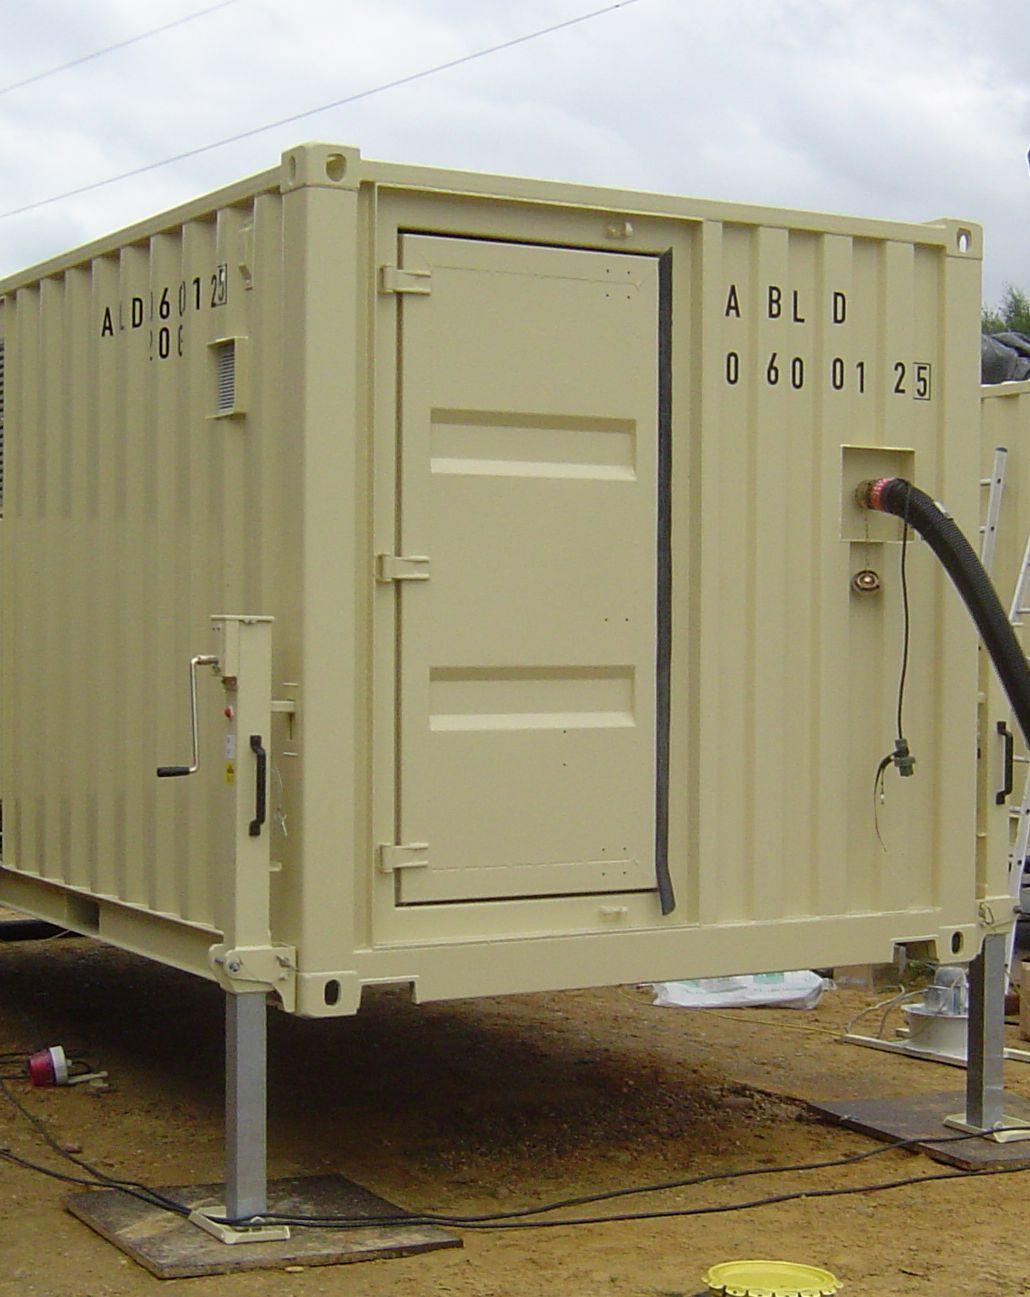 HETEK - ISO-Container und Strukturen | Arquitectura | Pinterest ...